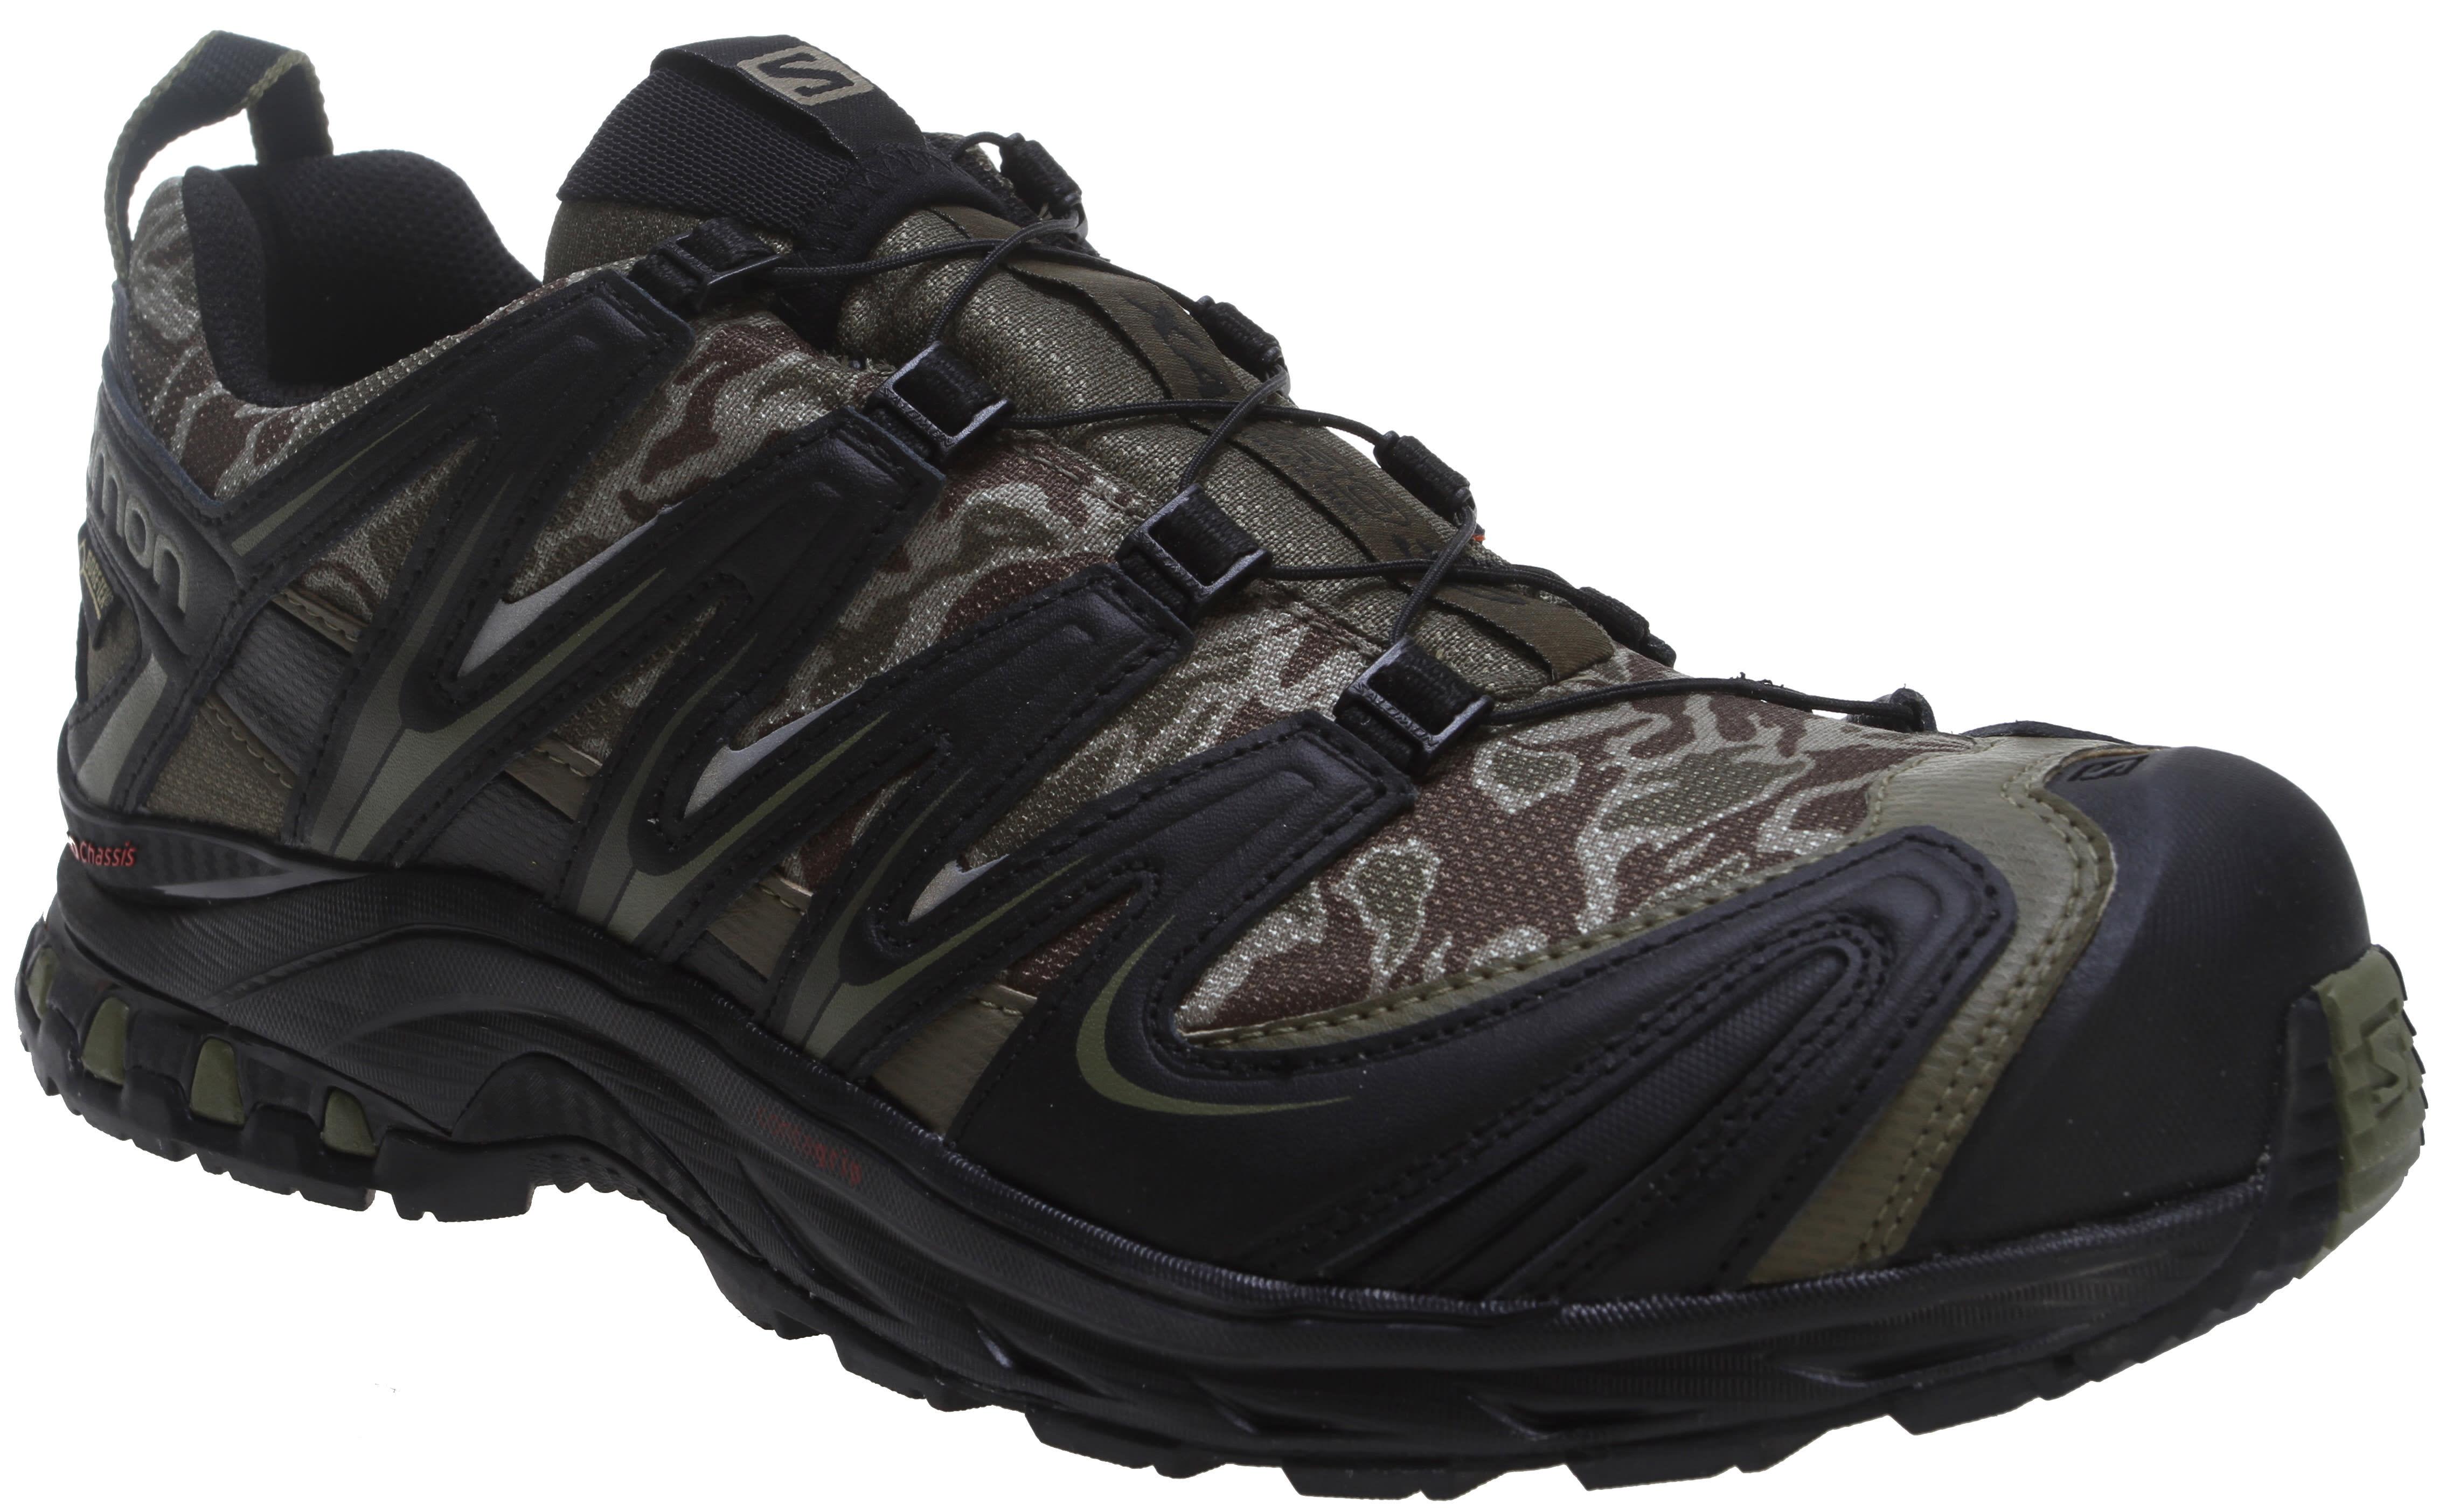 52d37a457f9 Salomon XA Pro 3D GTX Trail Running Shoes - thumbnail 2